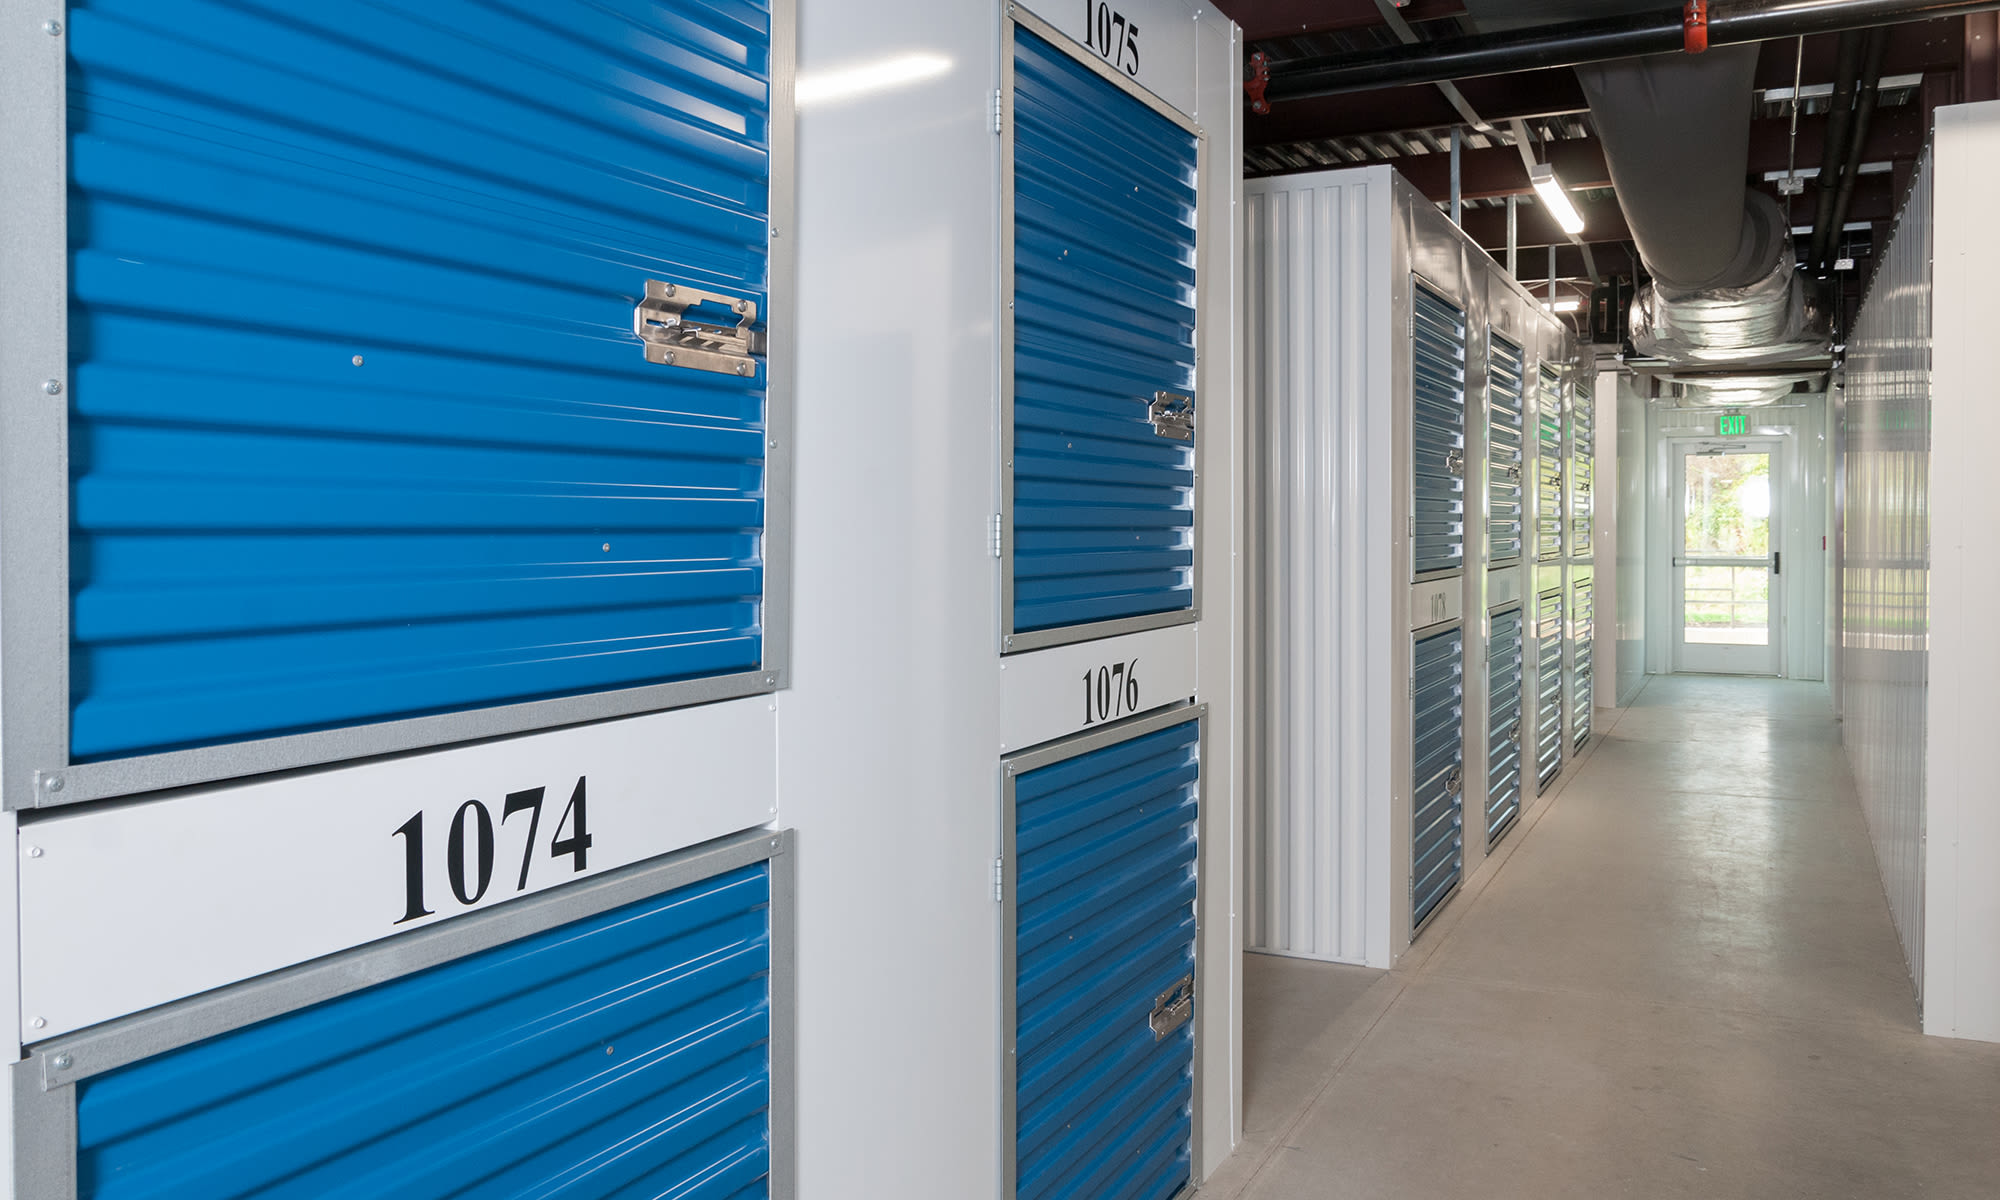 Small Locker Sized Units at Virginia Varsity Storage in Roanoke, Virginia is located